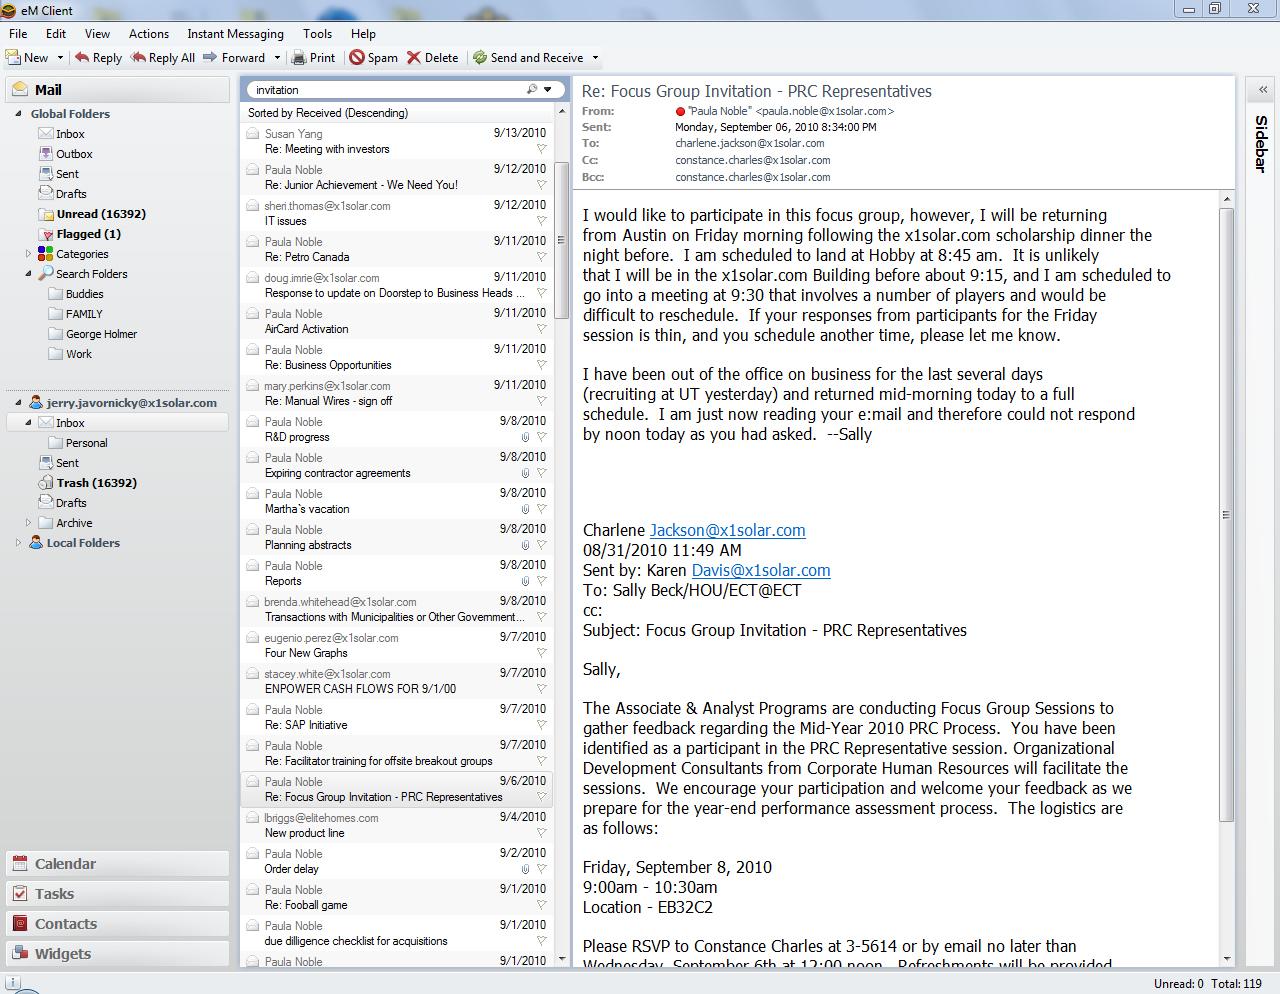 eM Client Screenshot